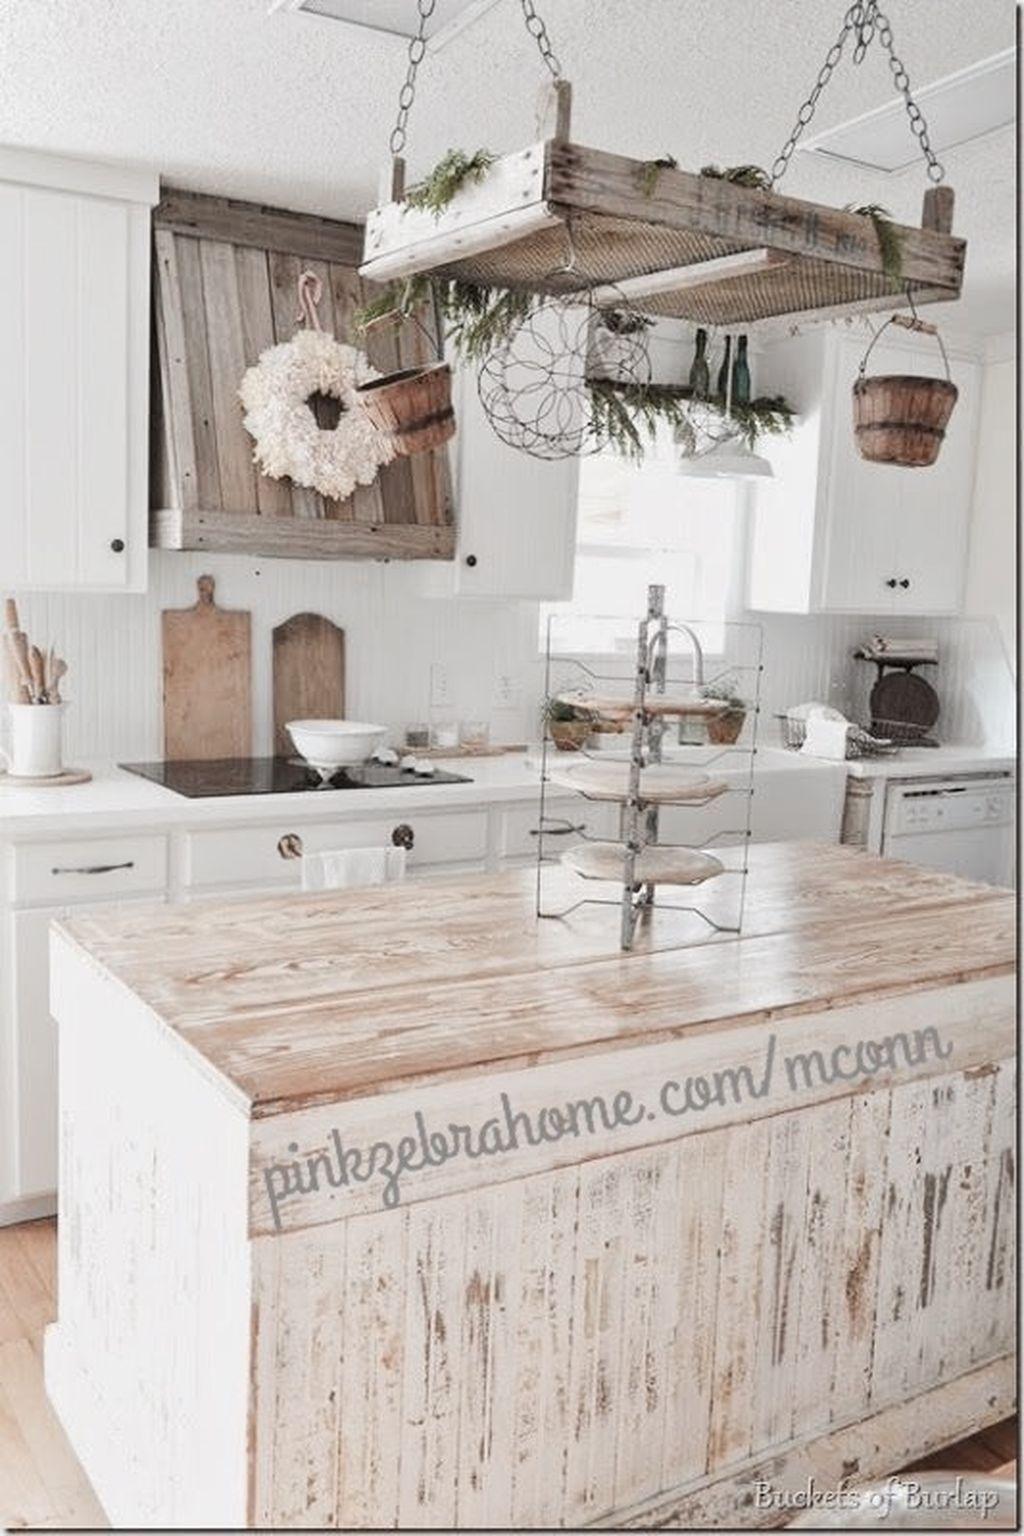 50 modern christmas kitchen decorating ideas kitchen decor christmas kitchen decor on kitchen xmas decor id=46478